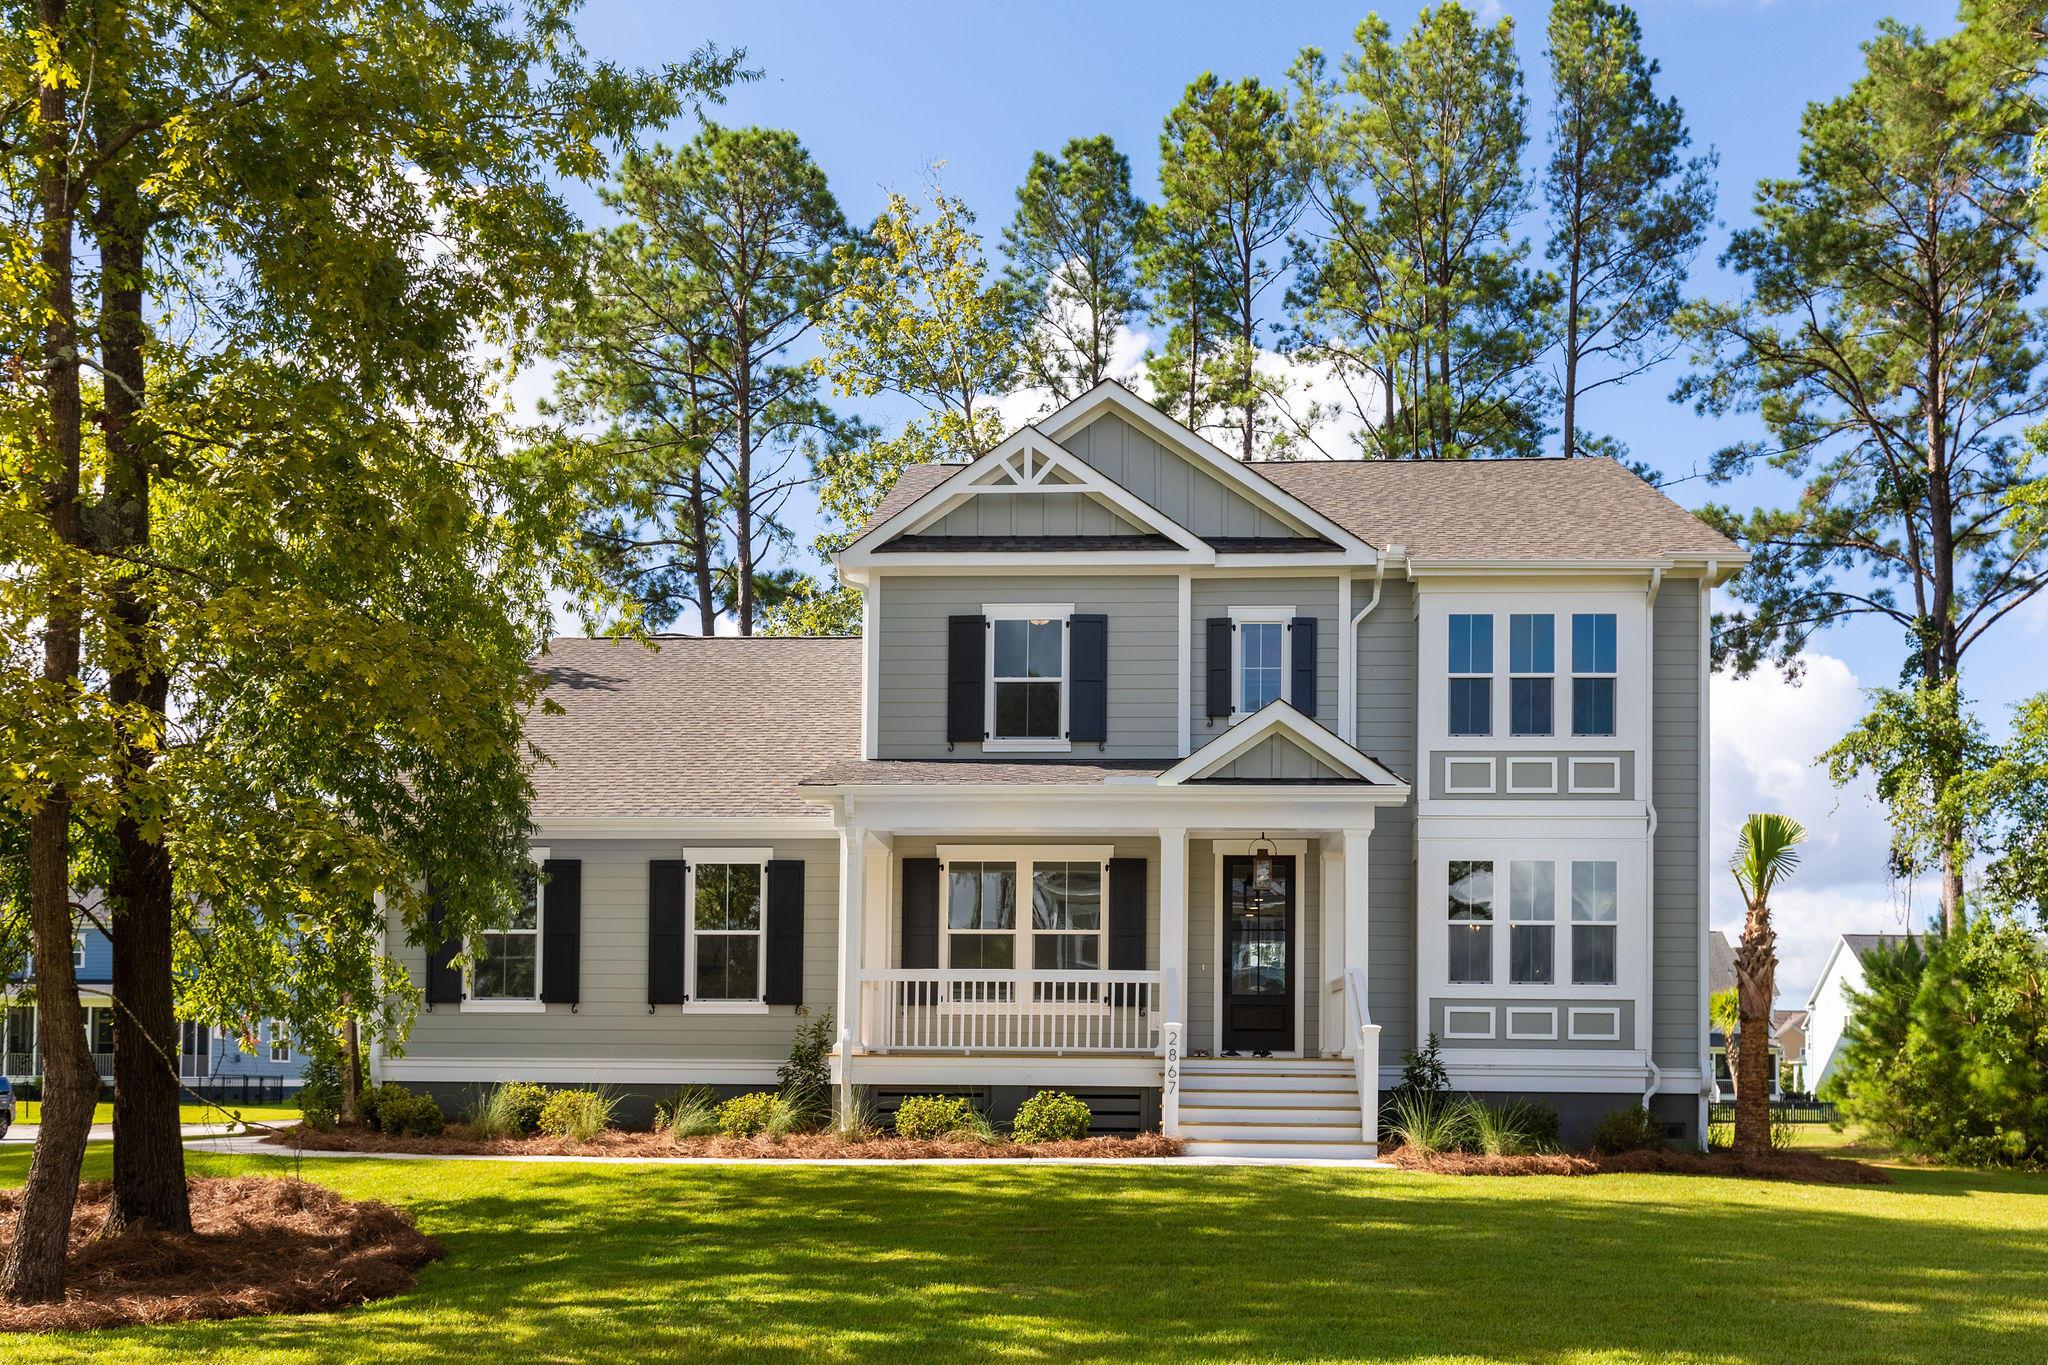 Park West Homes For Sale - 2291 Middlesex, Mount Pleasant, SC - 4